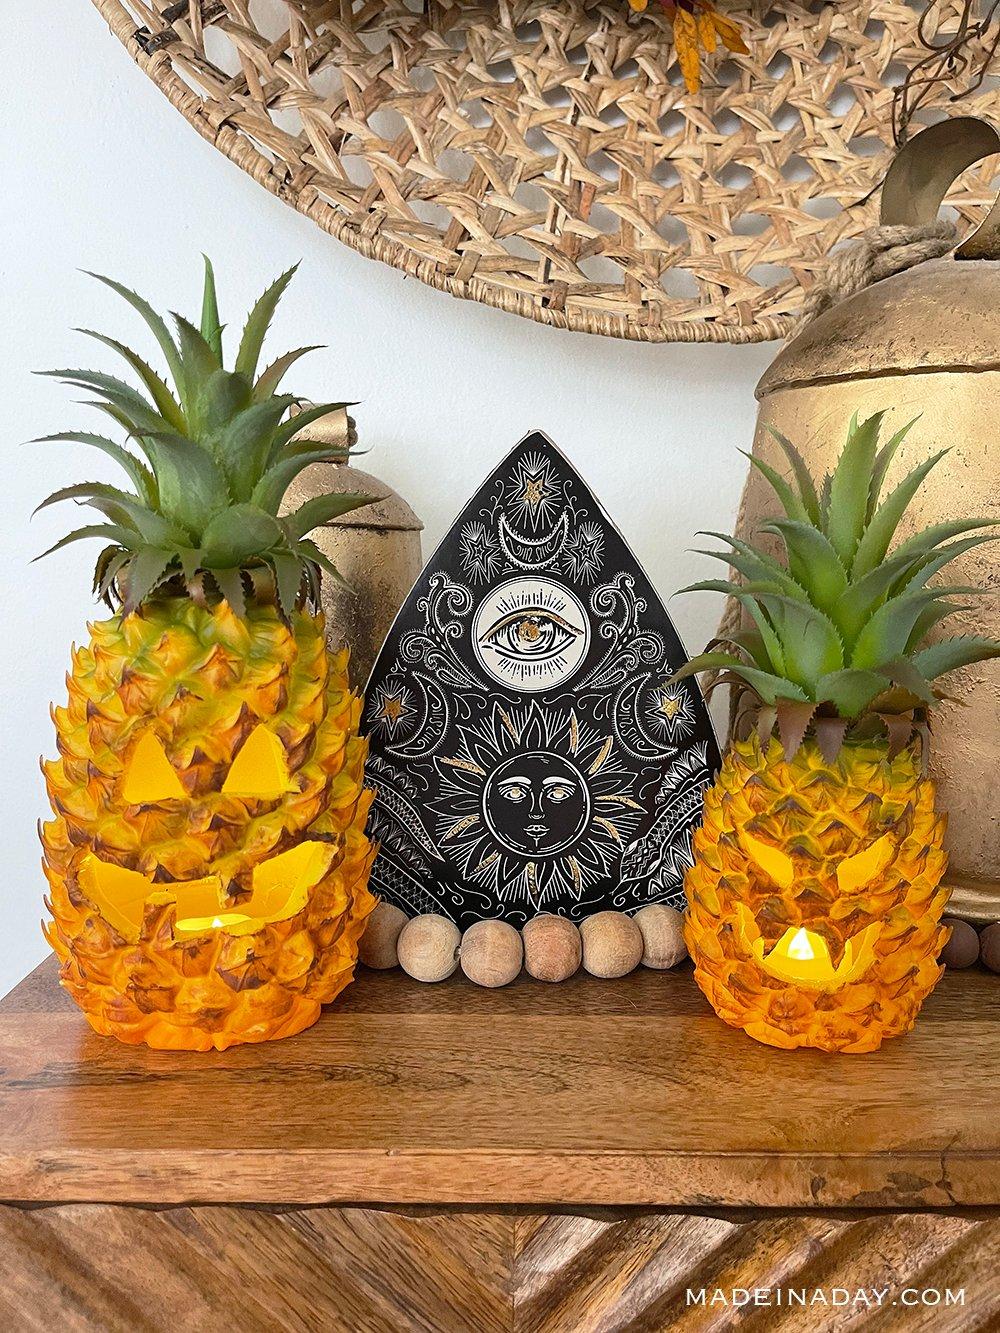 How to make a Plastic Pineapple Jack O Lantern